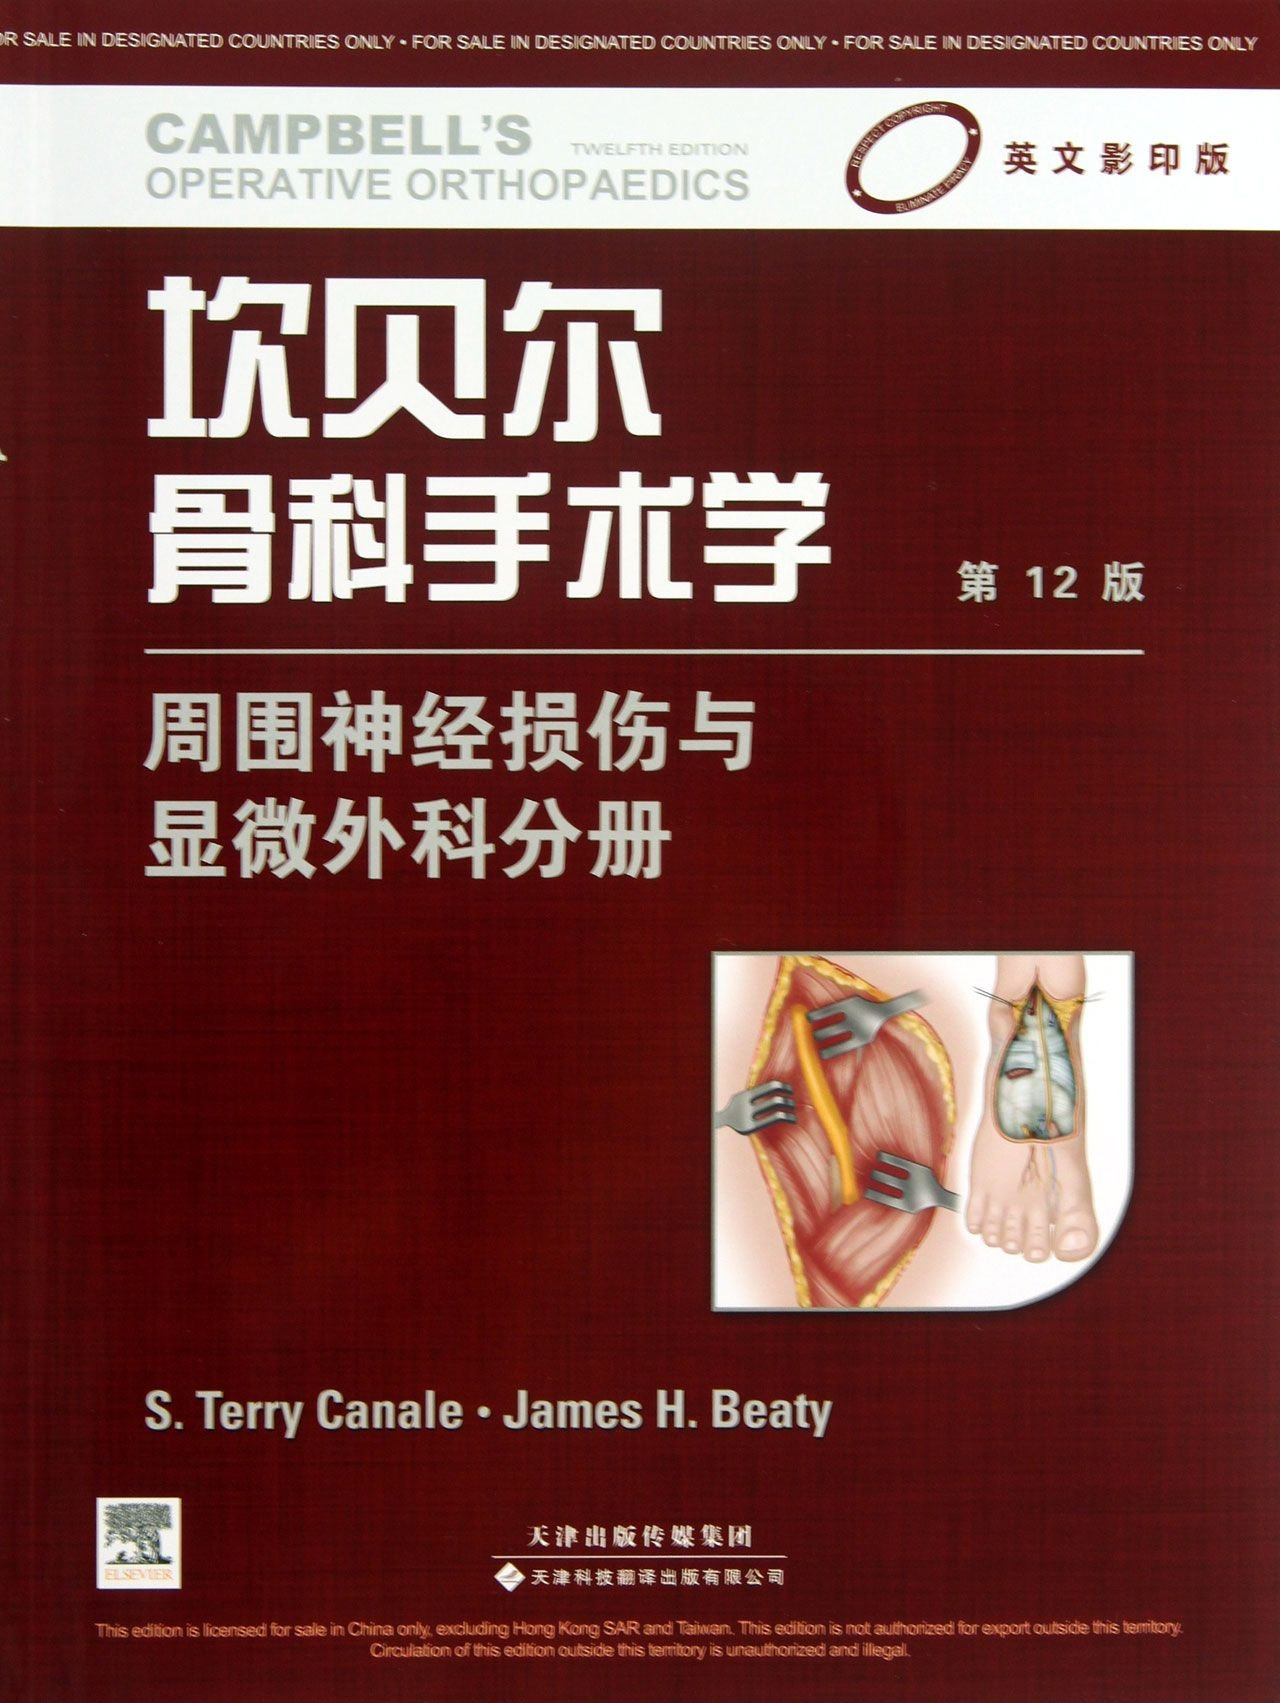 Download 坎贝尔骨科手术学:周围神经损伤与显微外科分册(影印版•第12版)(国外引进•铜版印刷) ebook